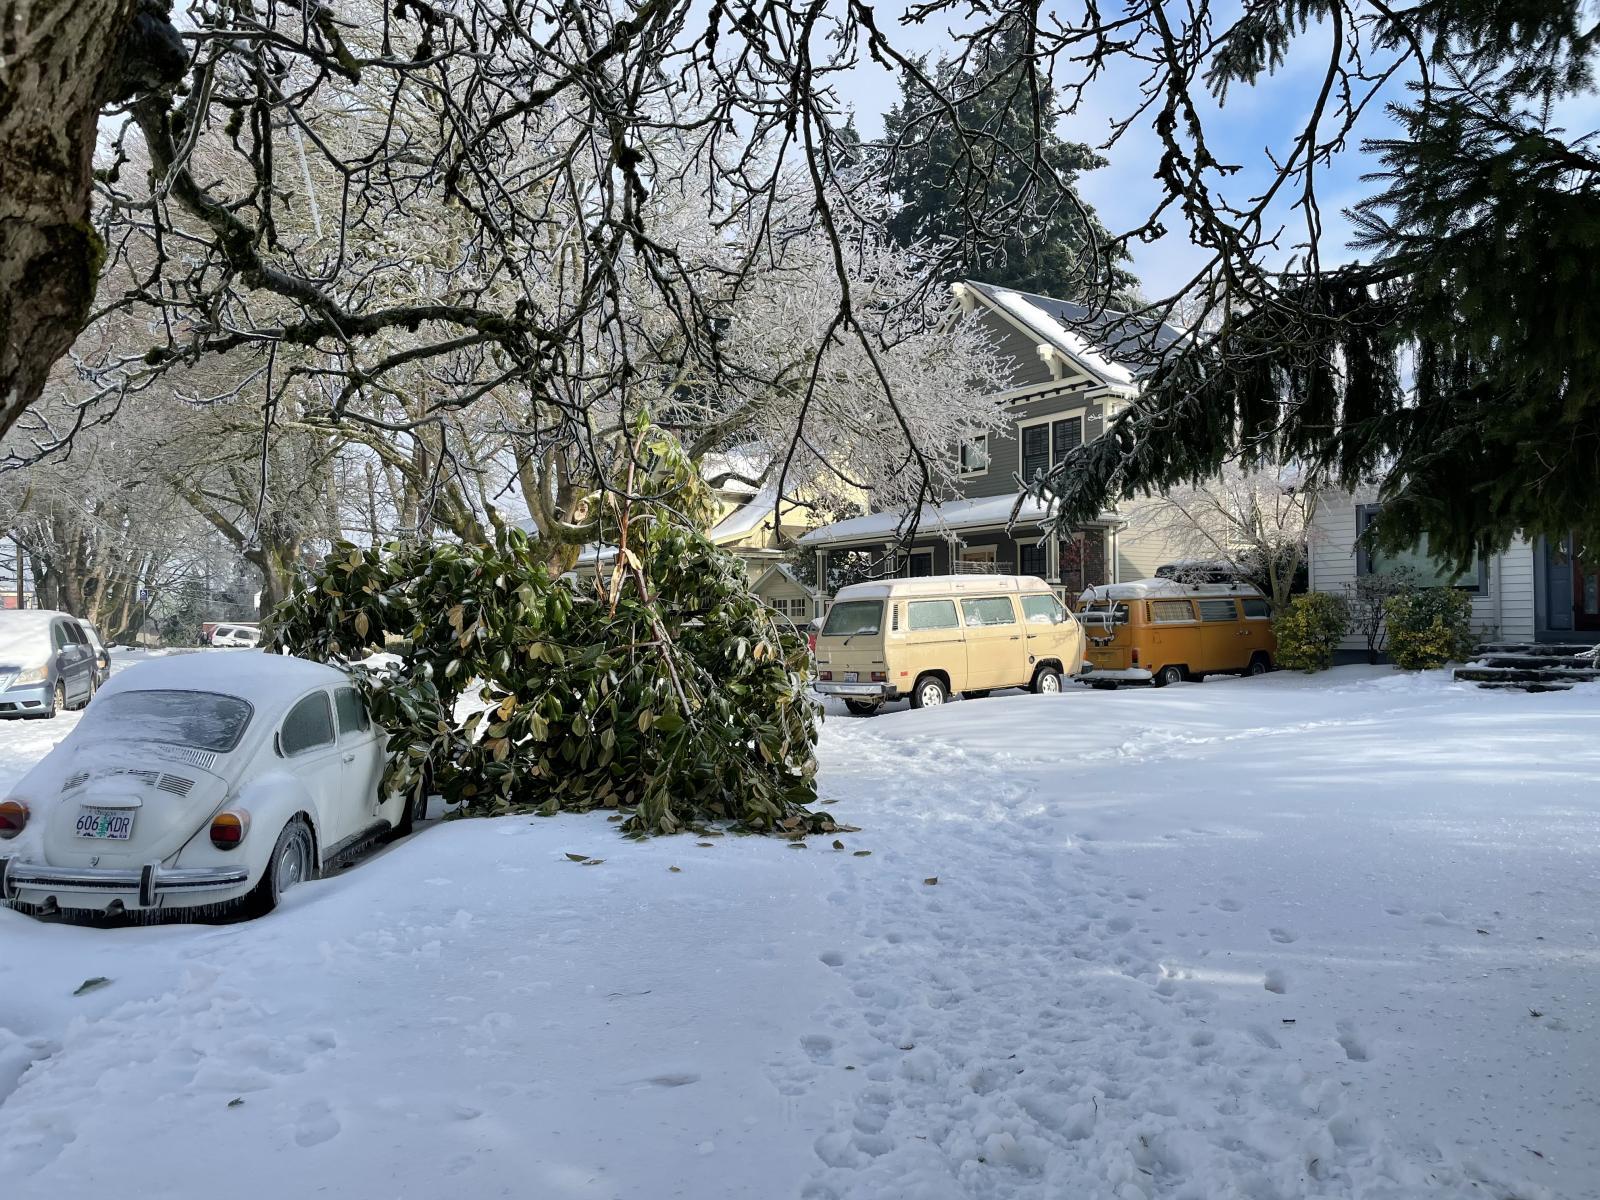 VWs in snow